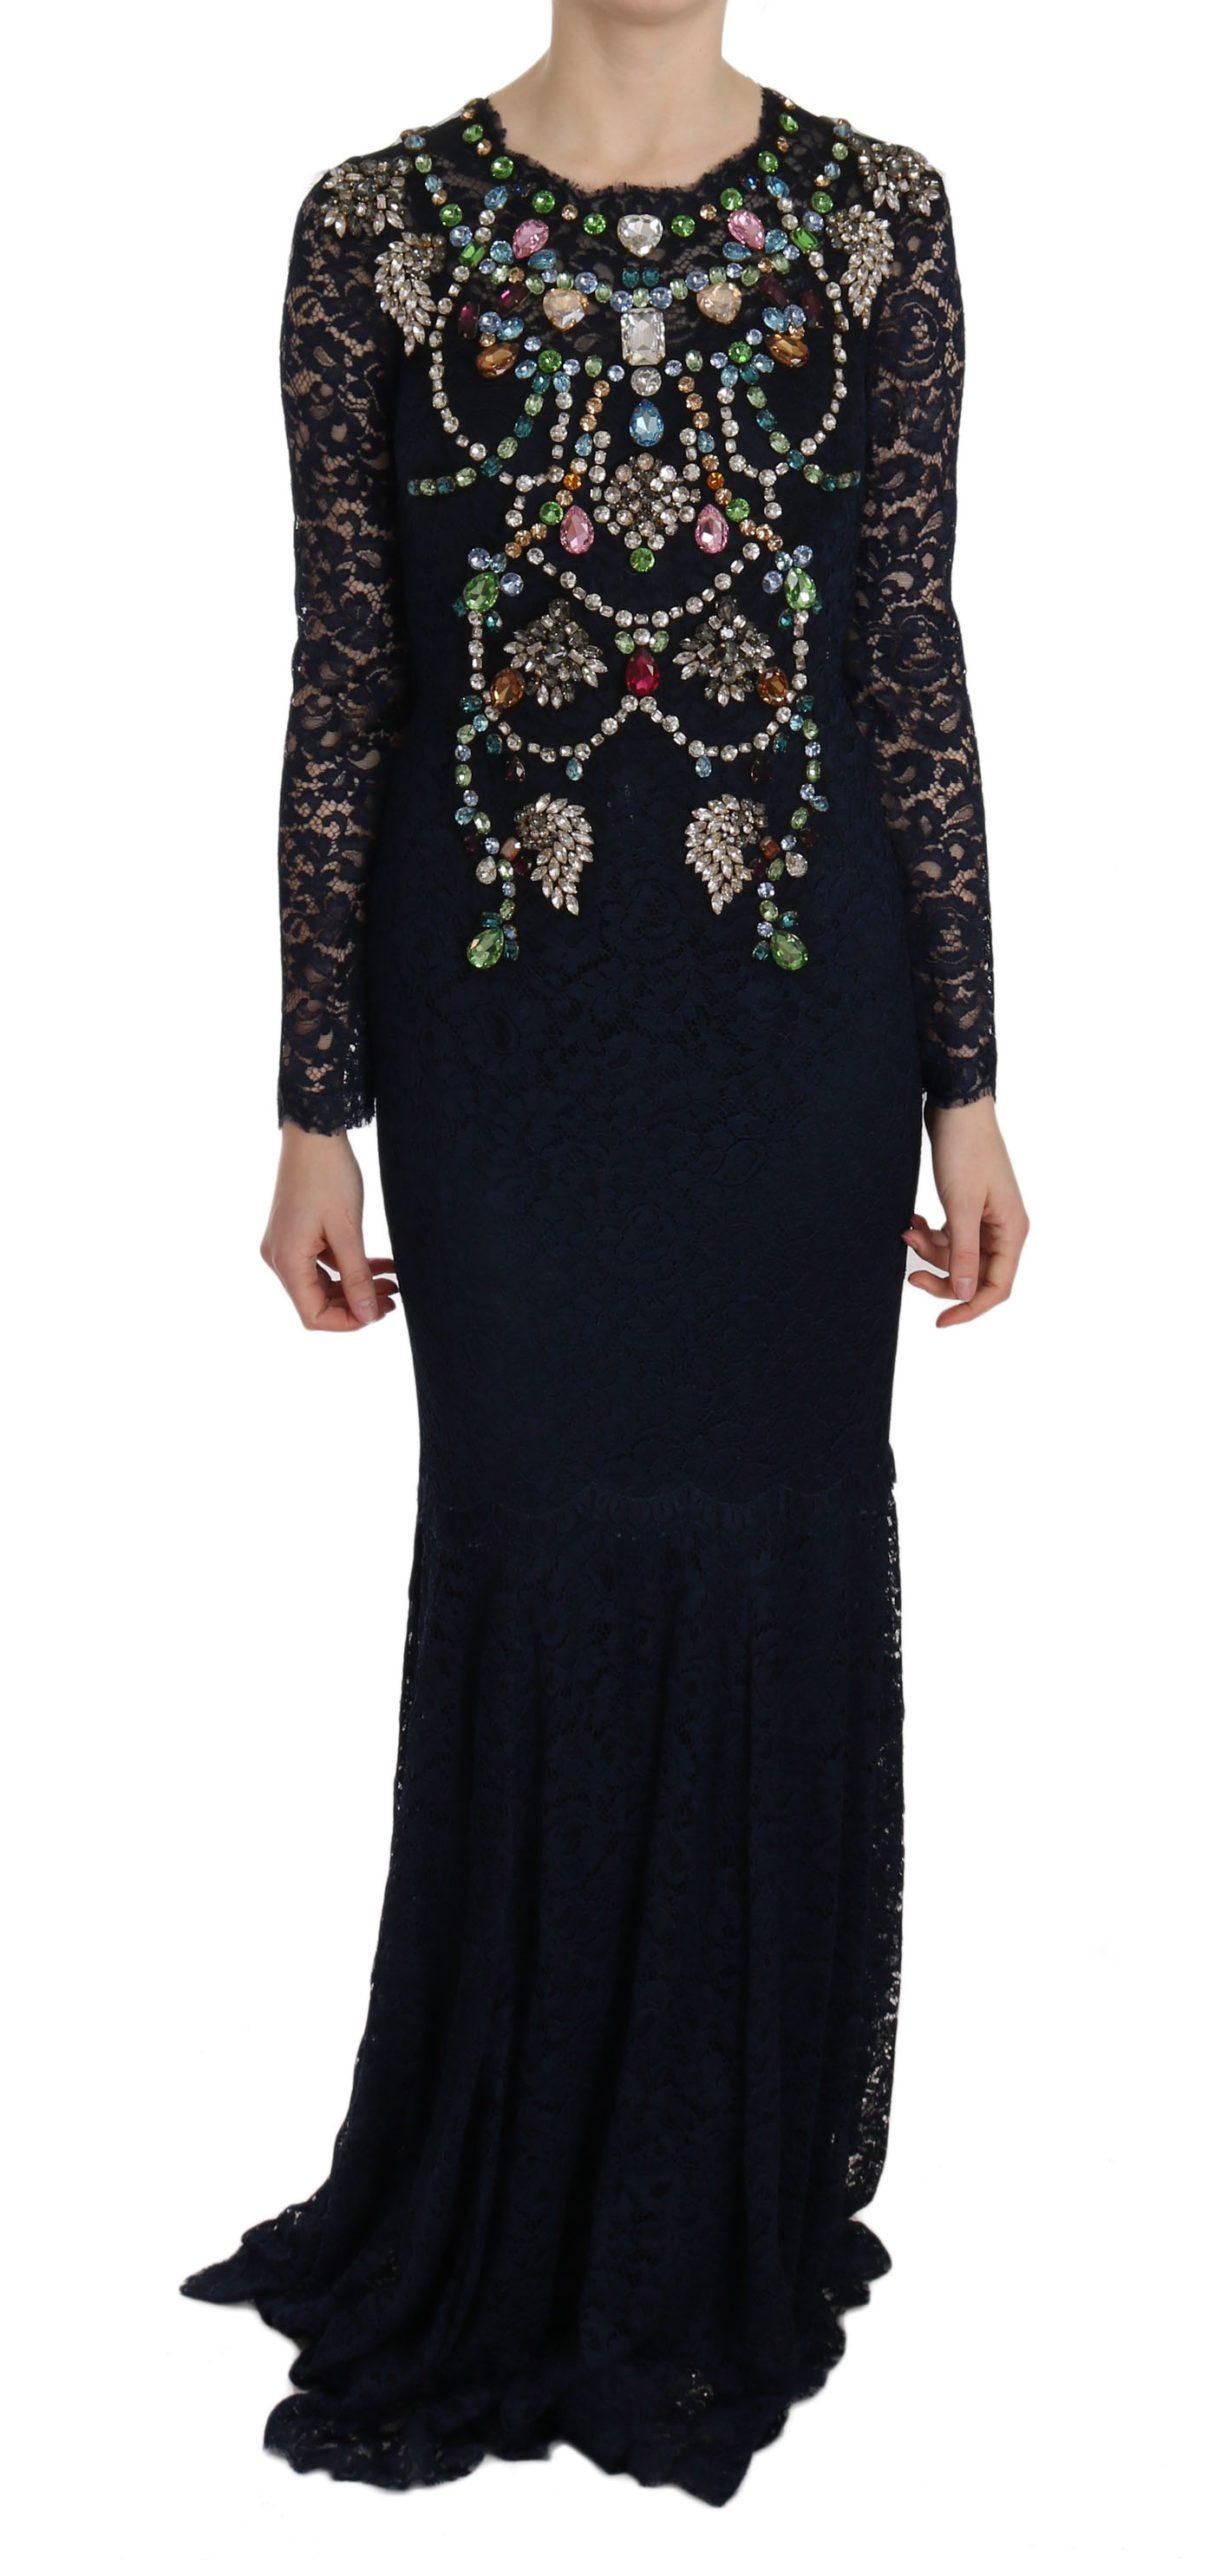 Dolce & Gabbana Women's Crystal Floral Lace Long Gown Dress Blue DR1665 - IT38|XS